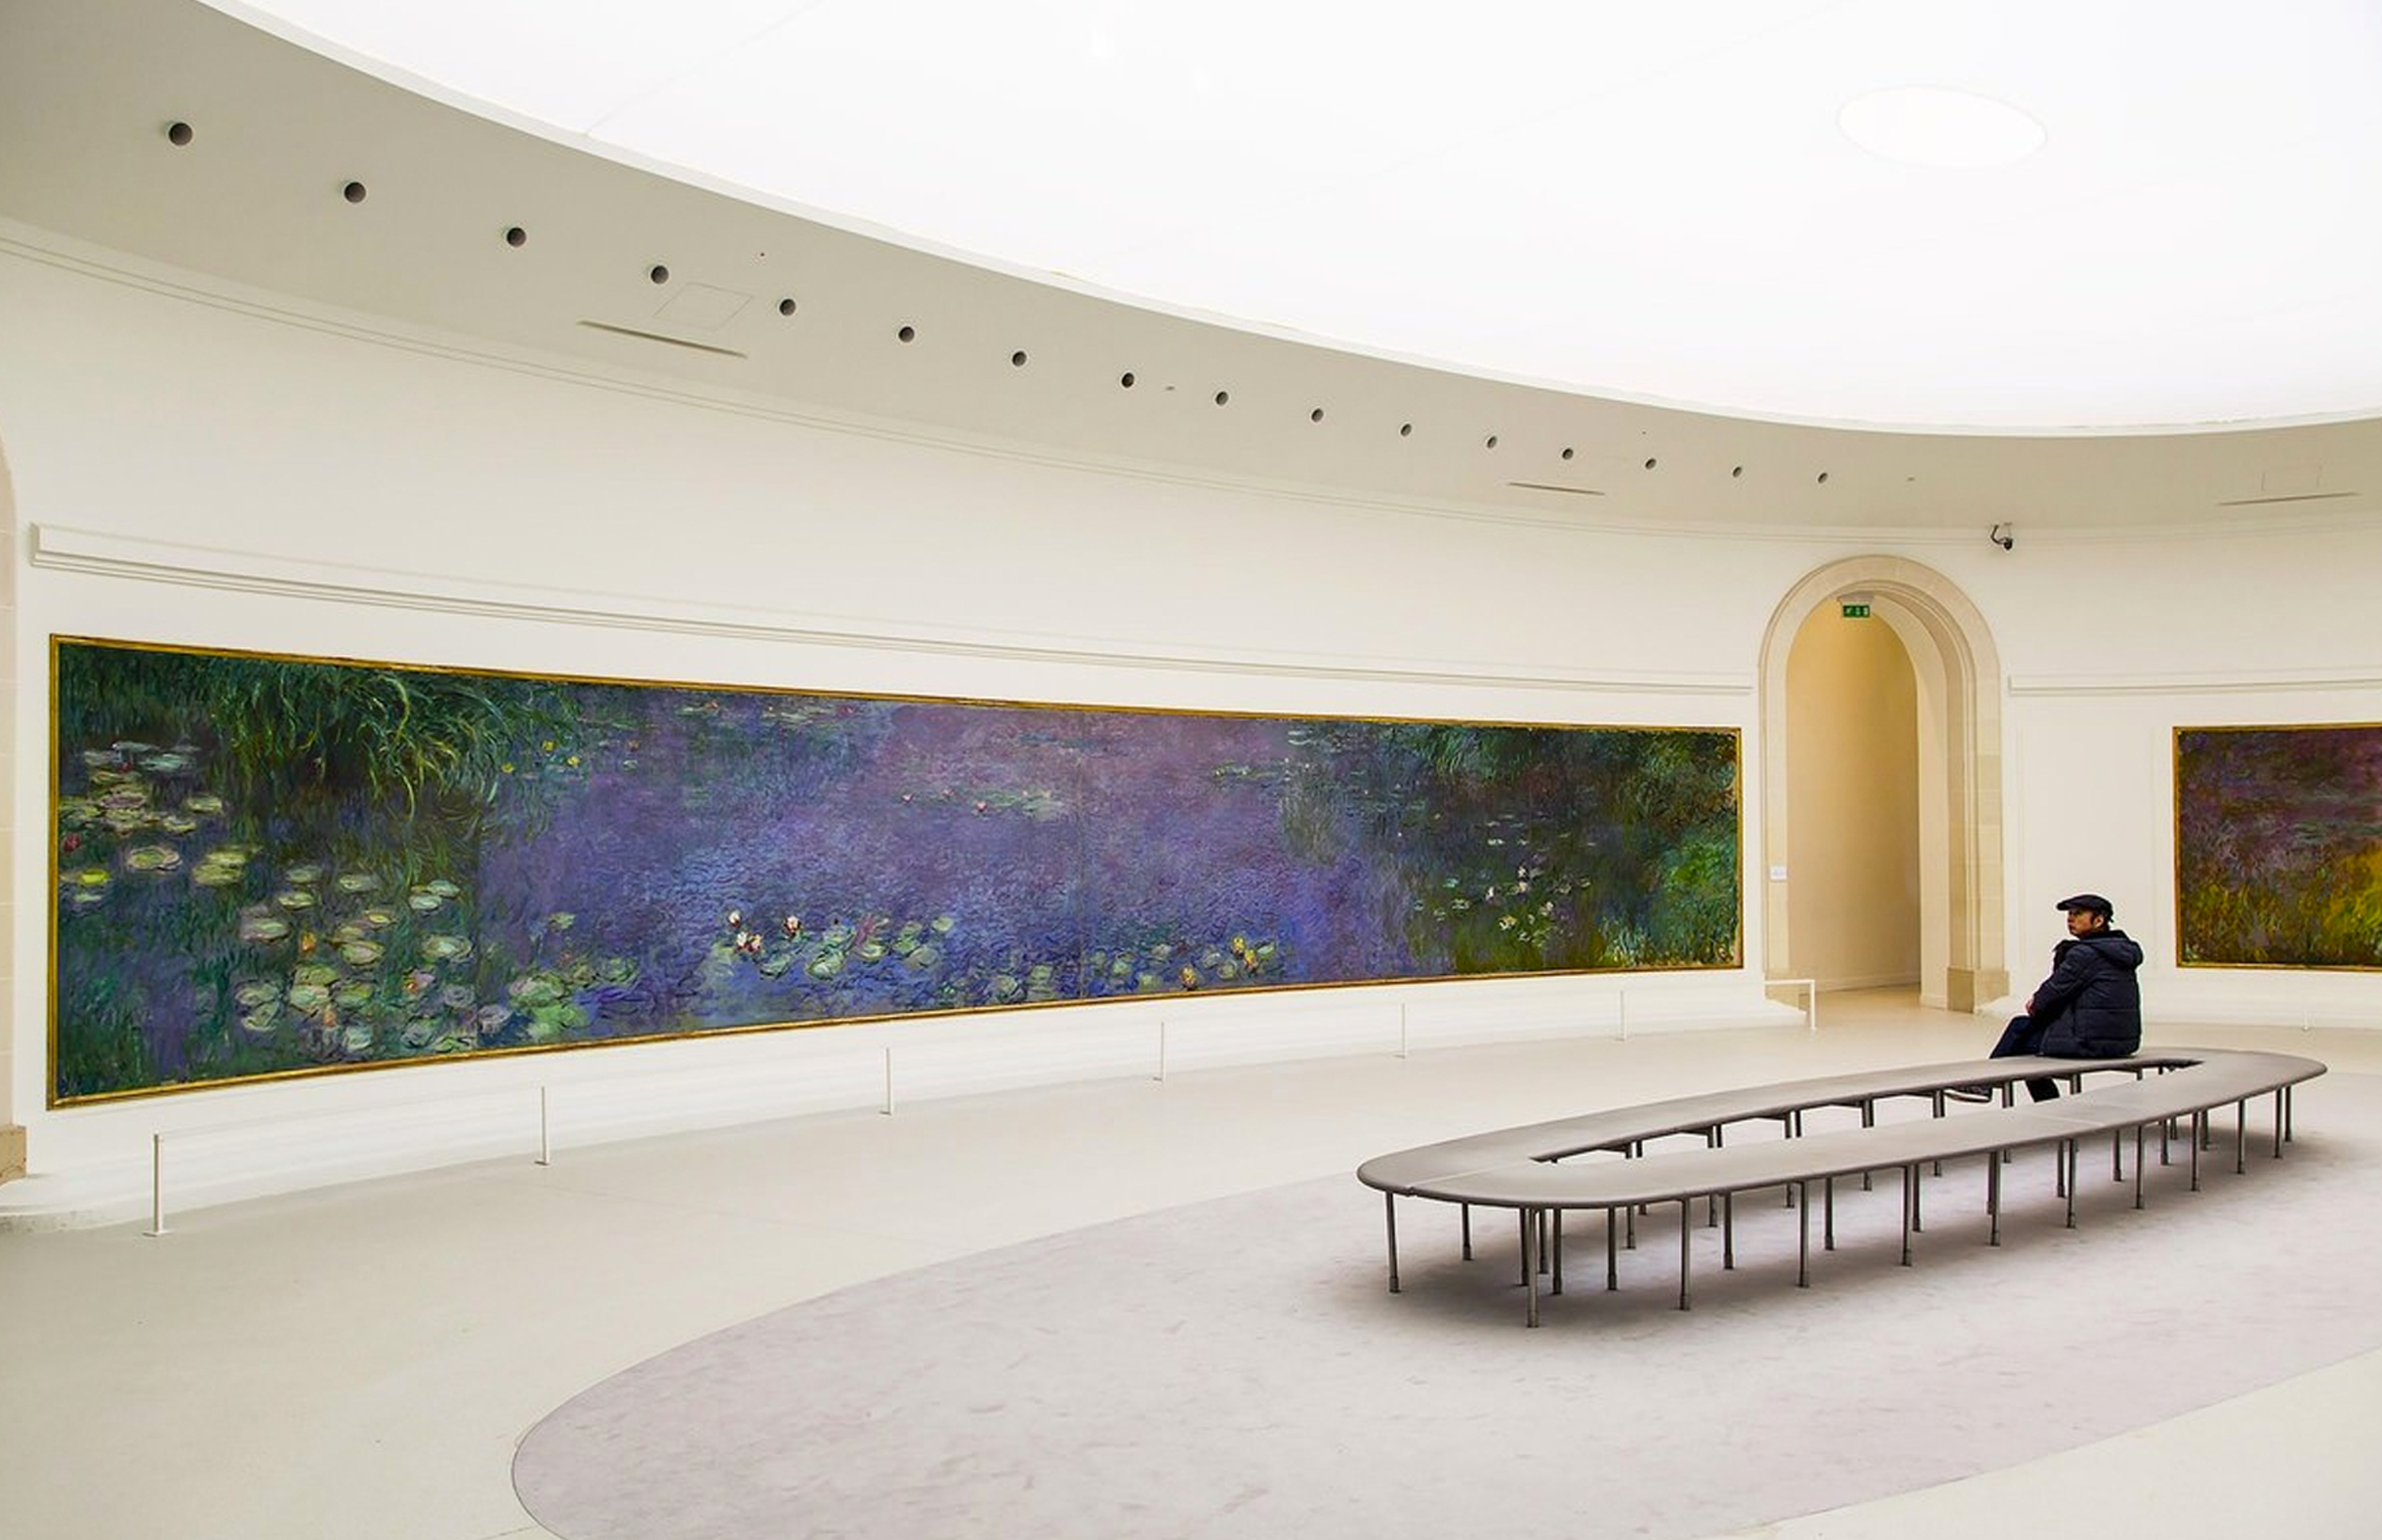 Monet Vr - Lucid Realities